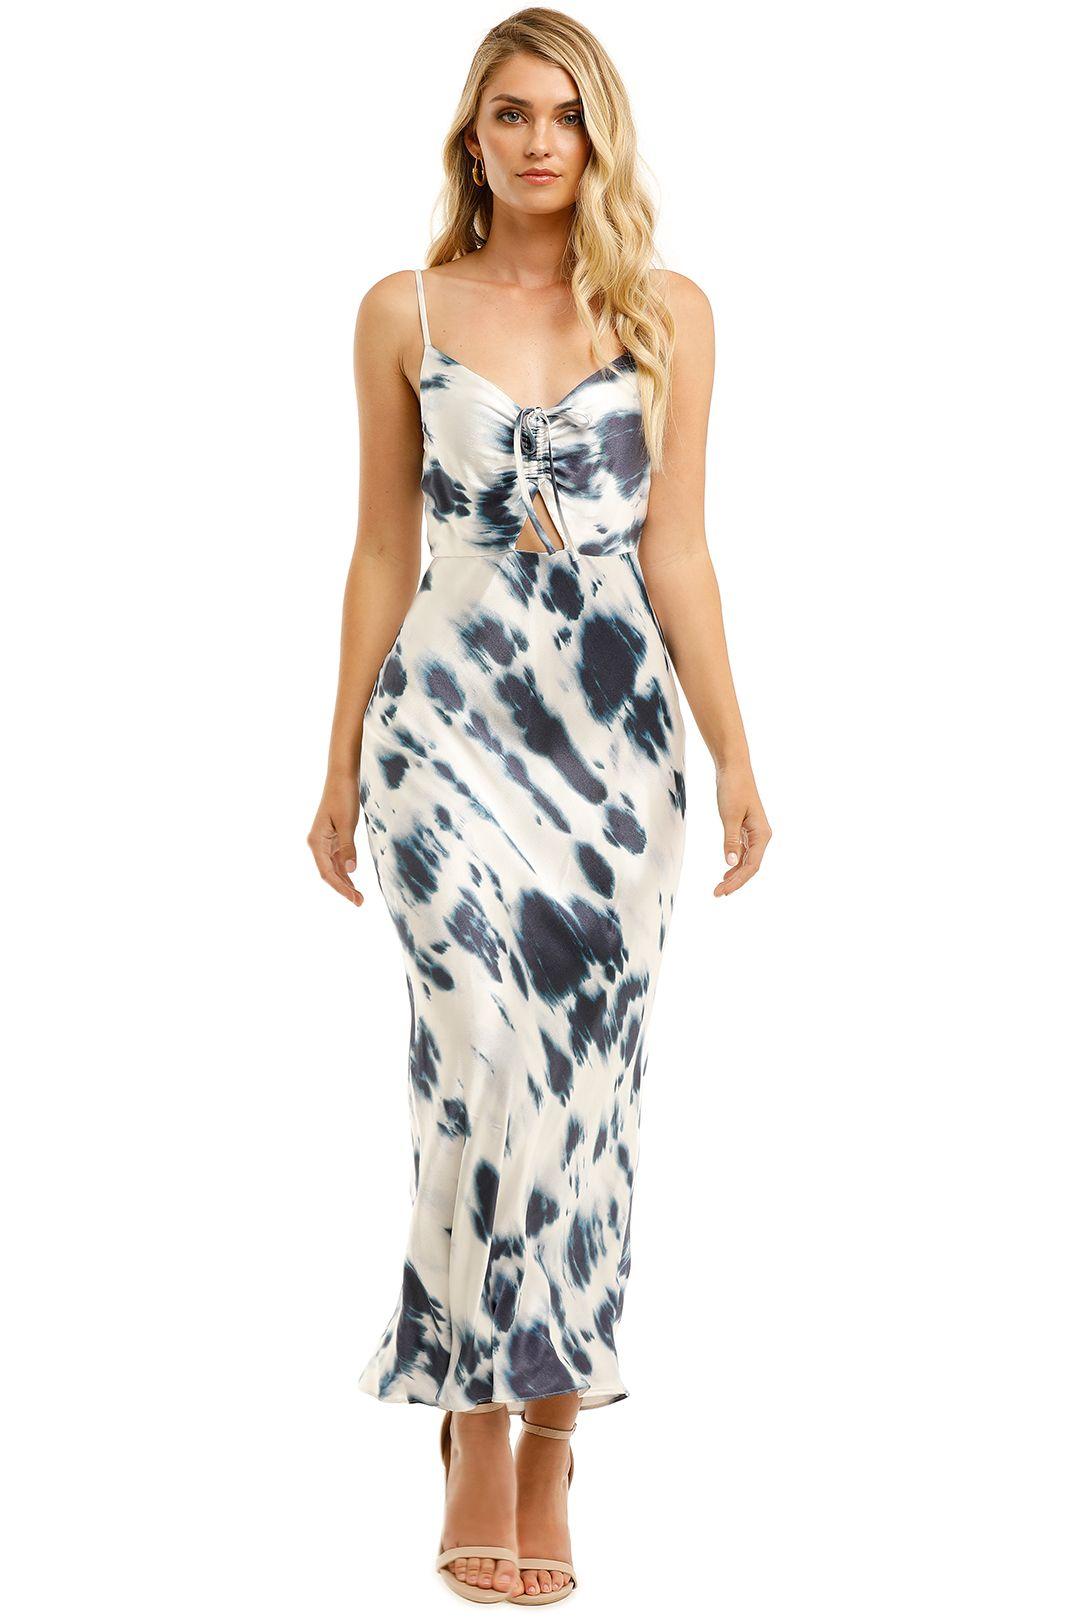 Shona-Joy-Palmar-Ruched-Bias-Slip-Dress-Ivory-Ink-Front